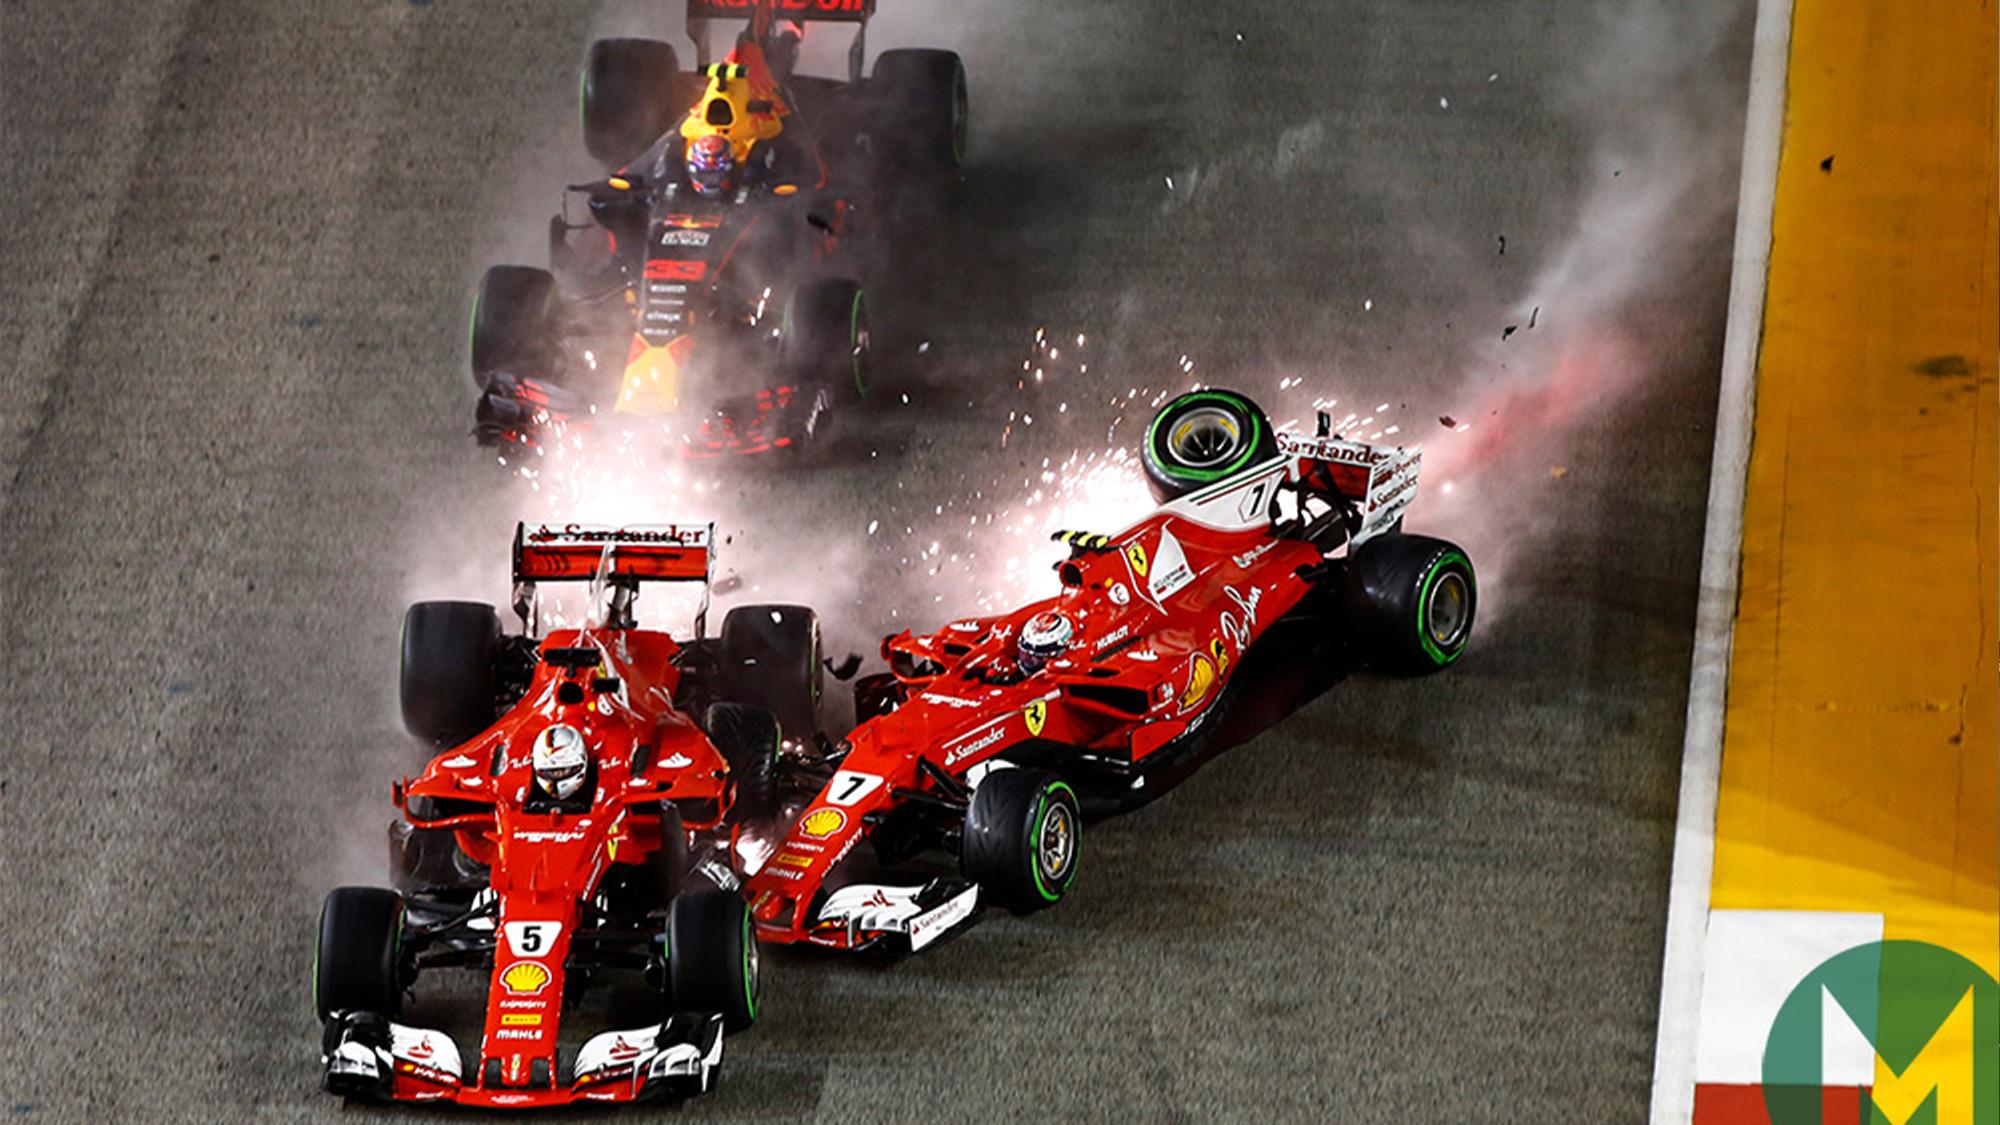 Sebastian Vettel, Kimi Raikkonen and Max Verstappen collide at the 2017 Singapore Grand Prix